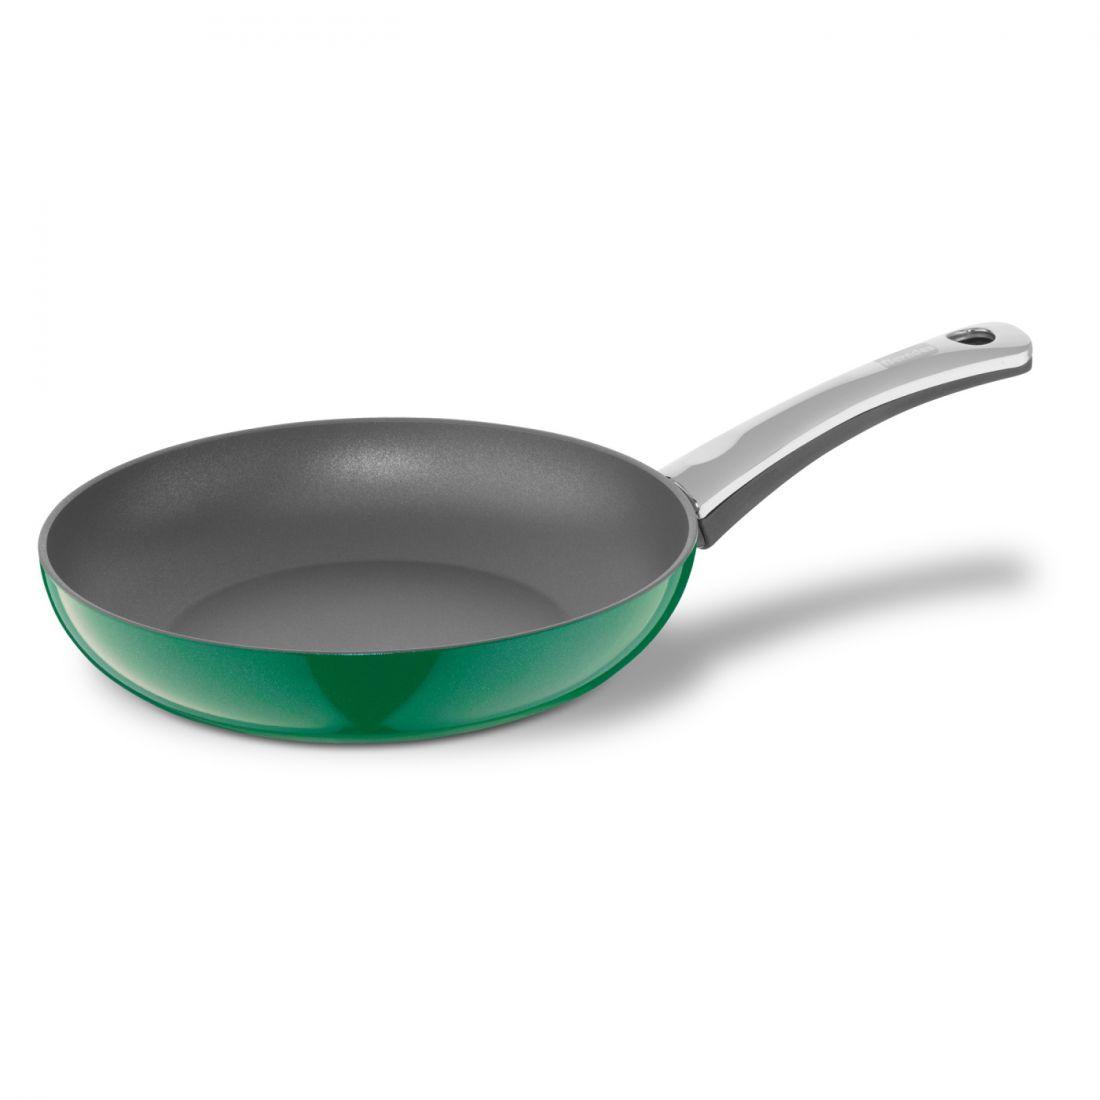 сковорода 24 - ALU COLOR INDUCTION, Berndes